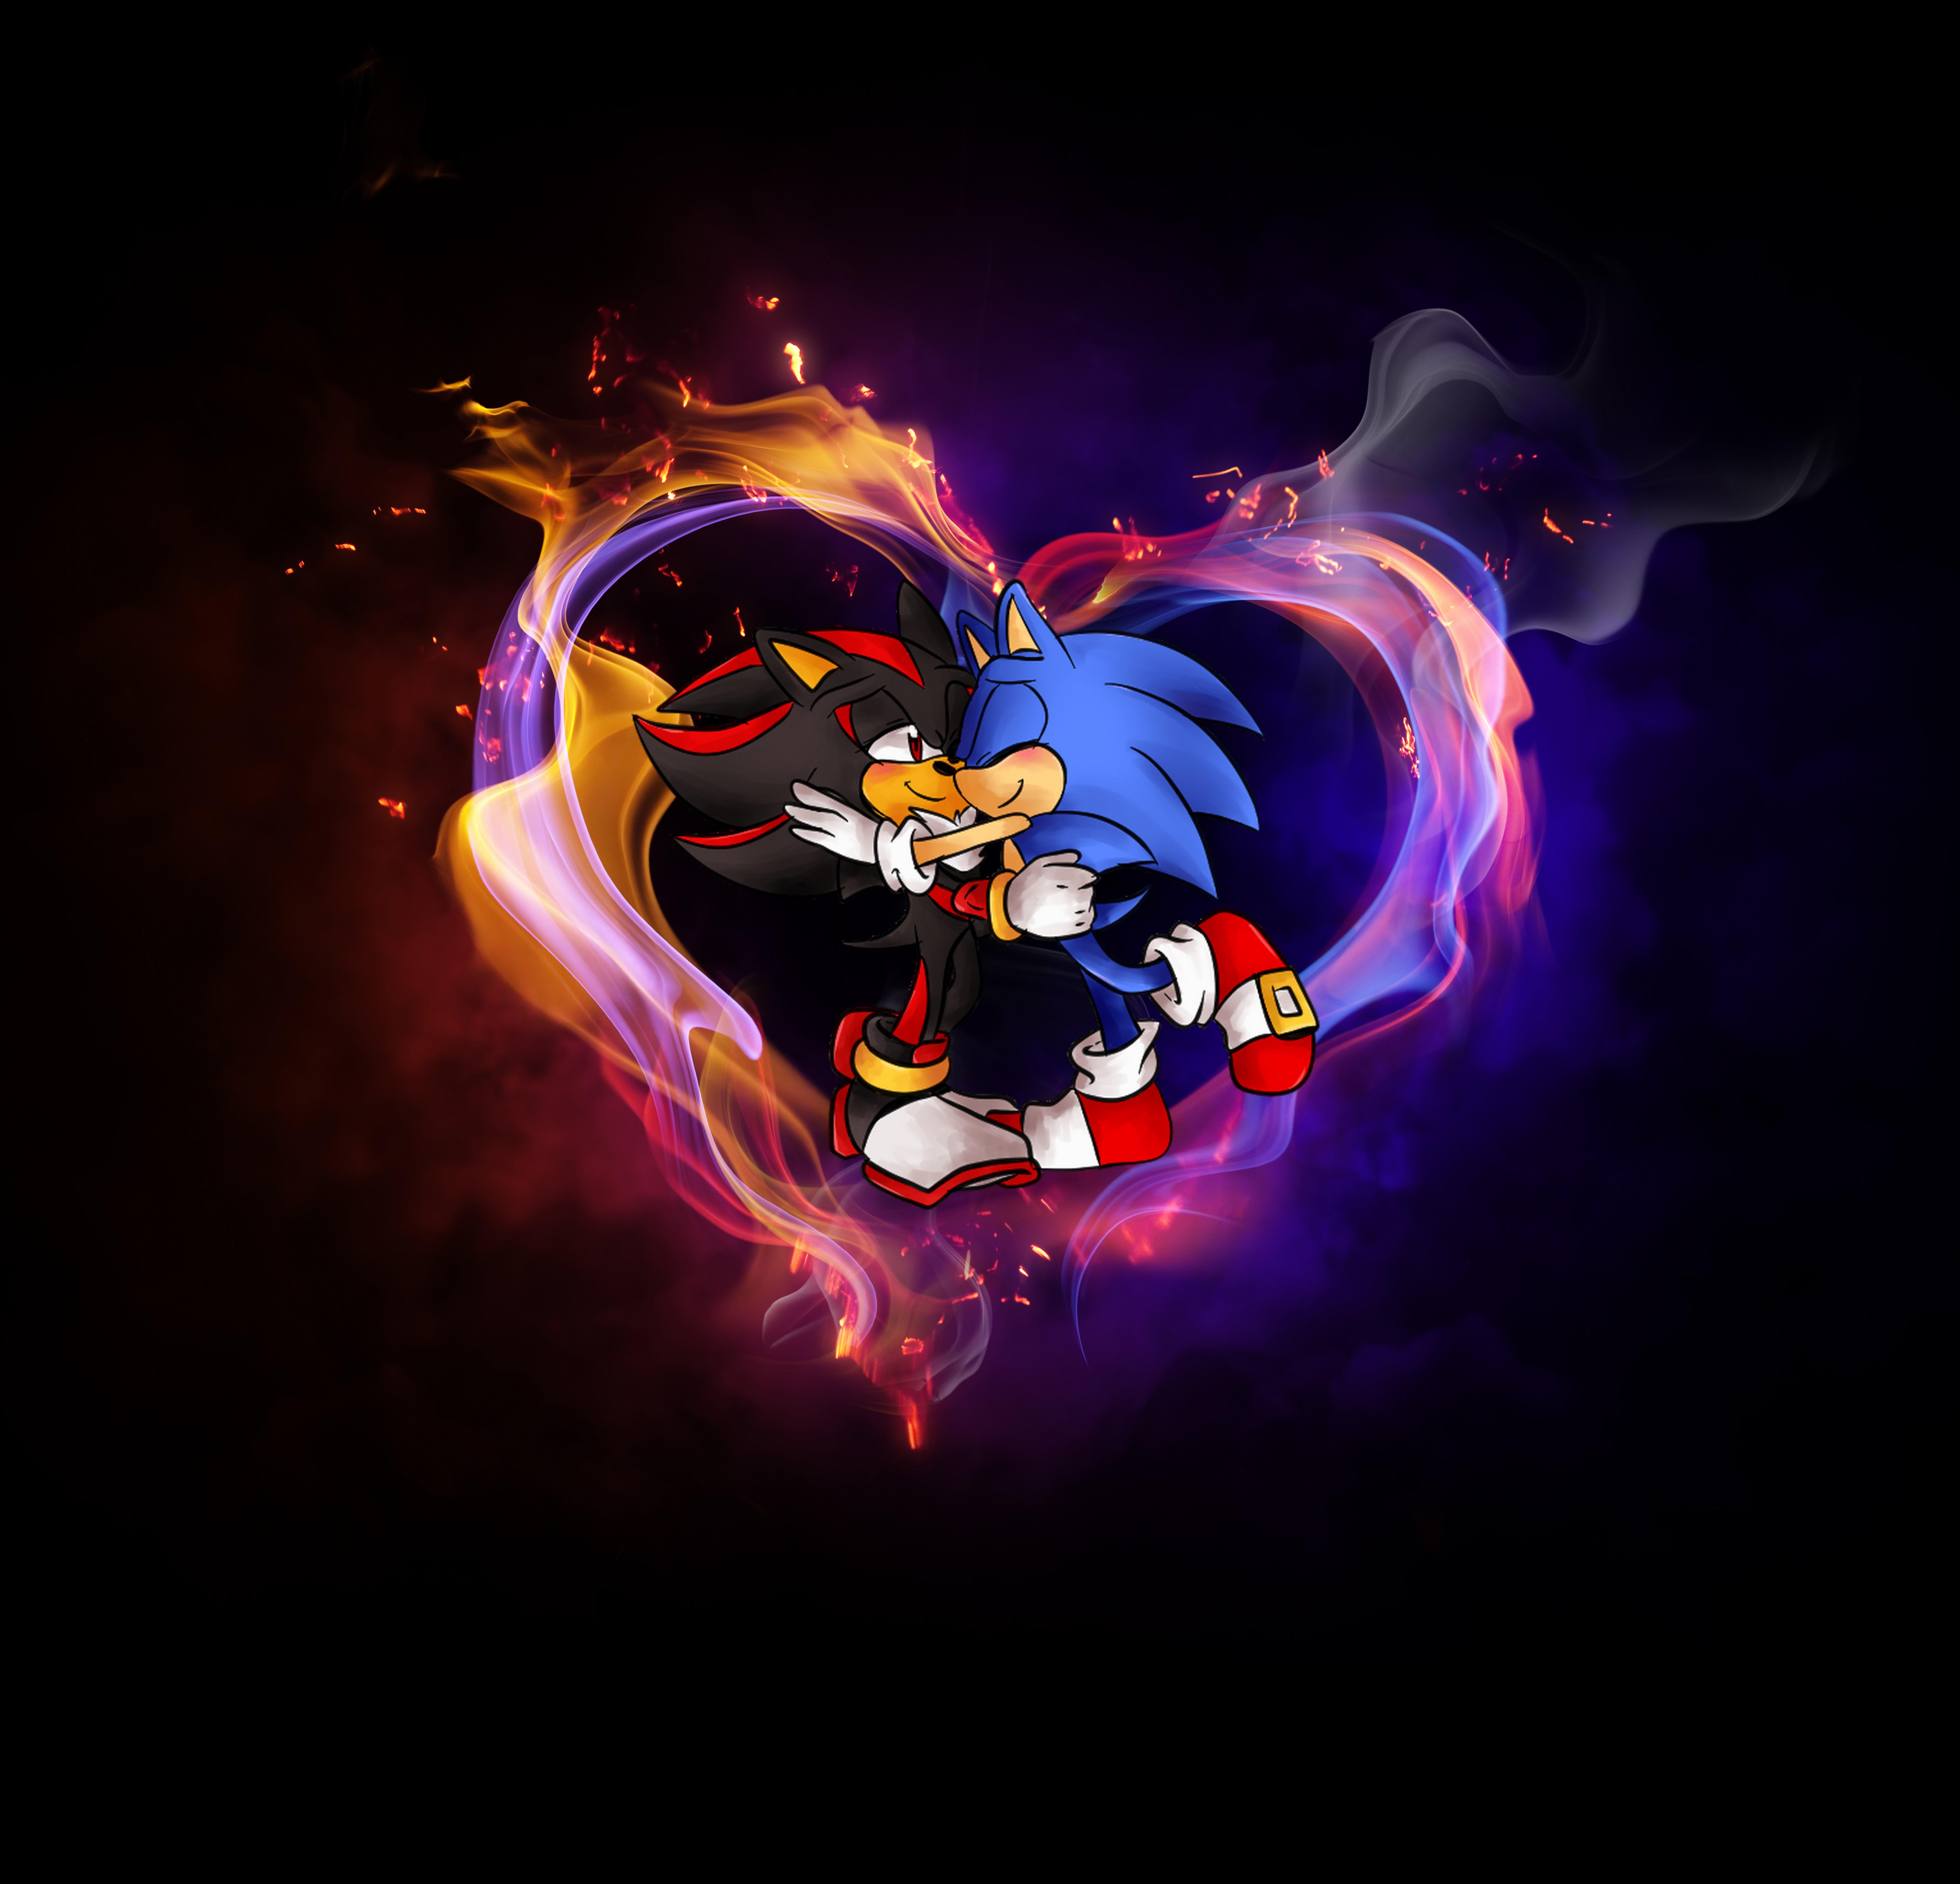 Sonadow Wallpaper By Sonic Werehog Fury